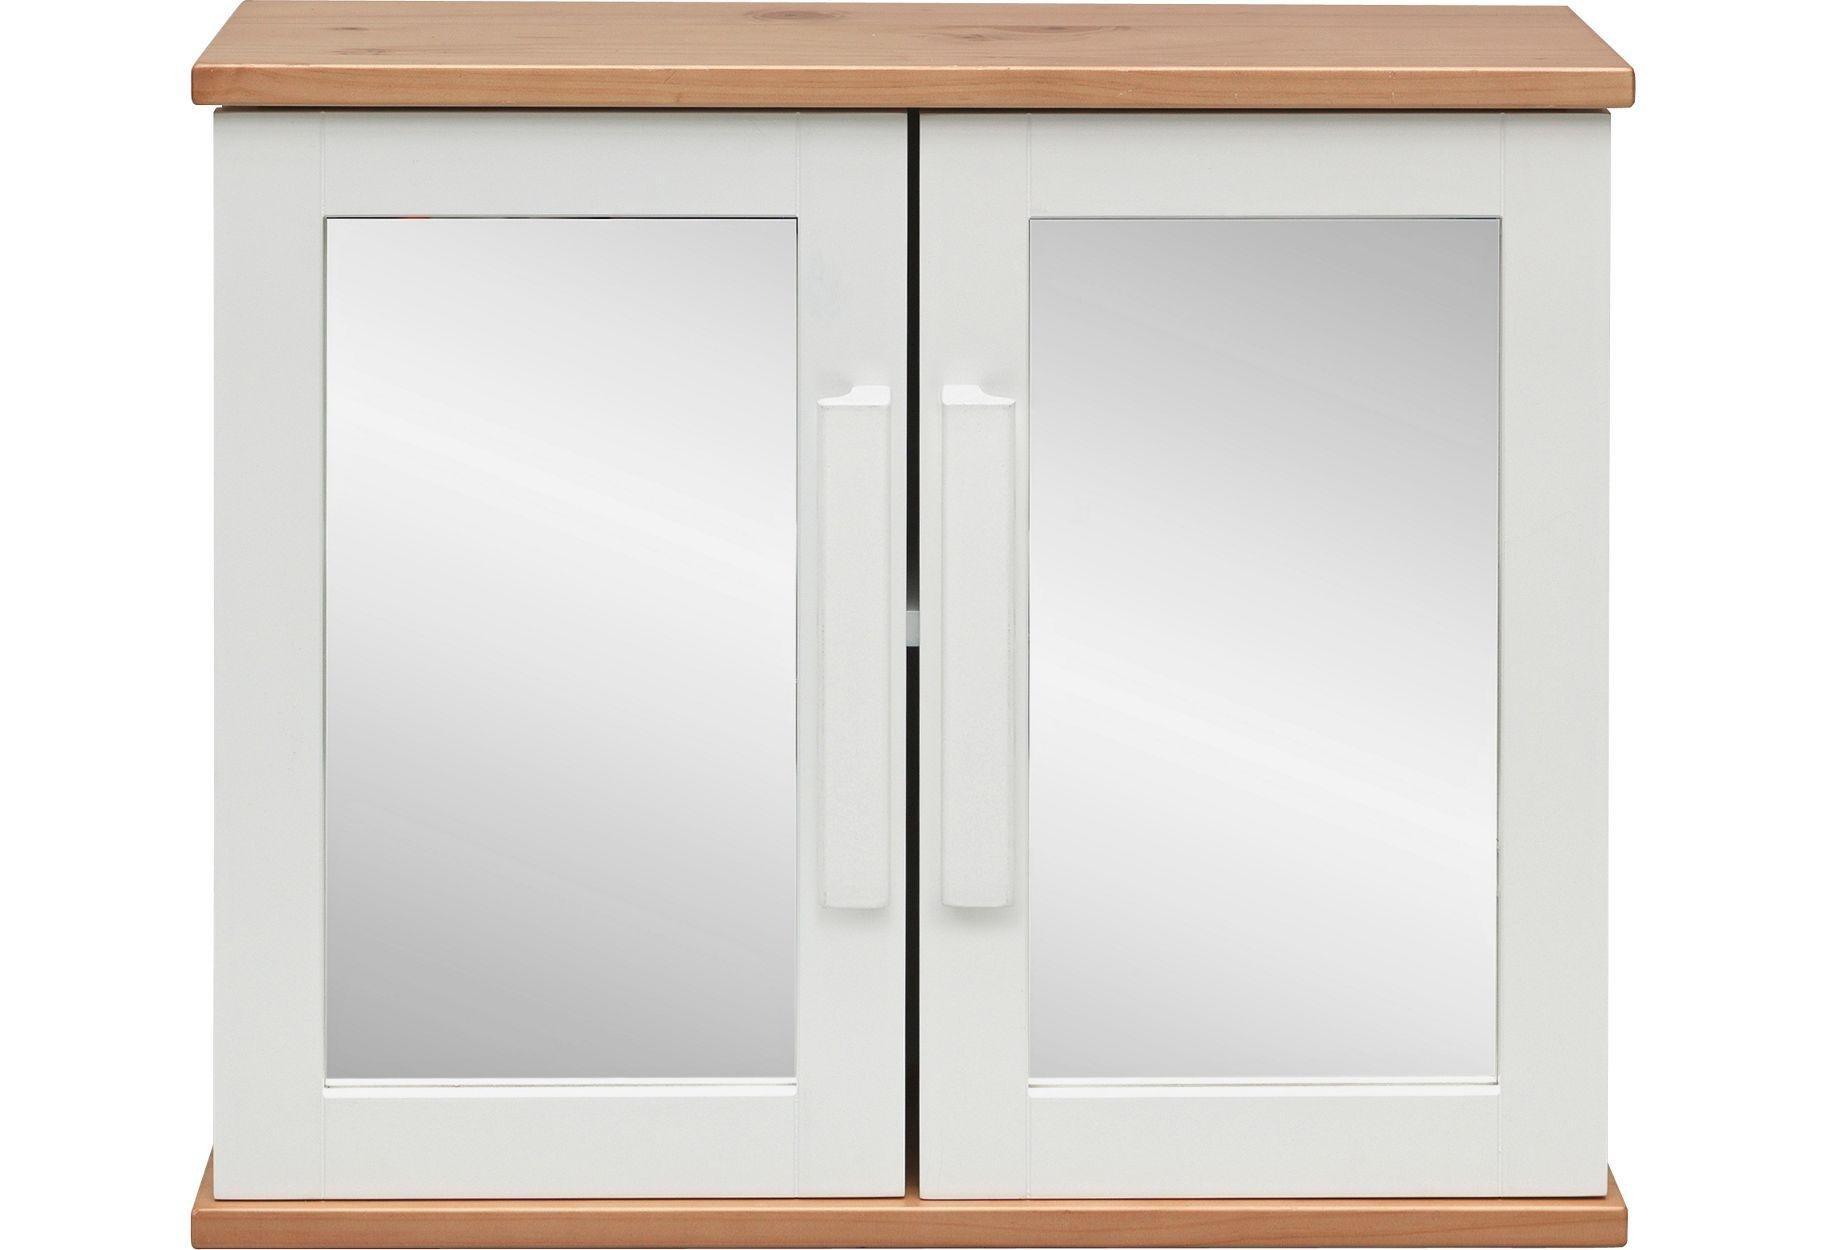 heart of house sandford mirrored bathroom wall cabinet